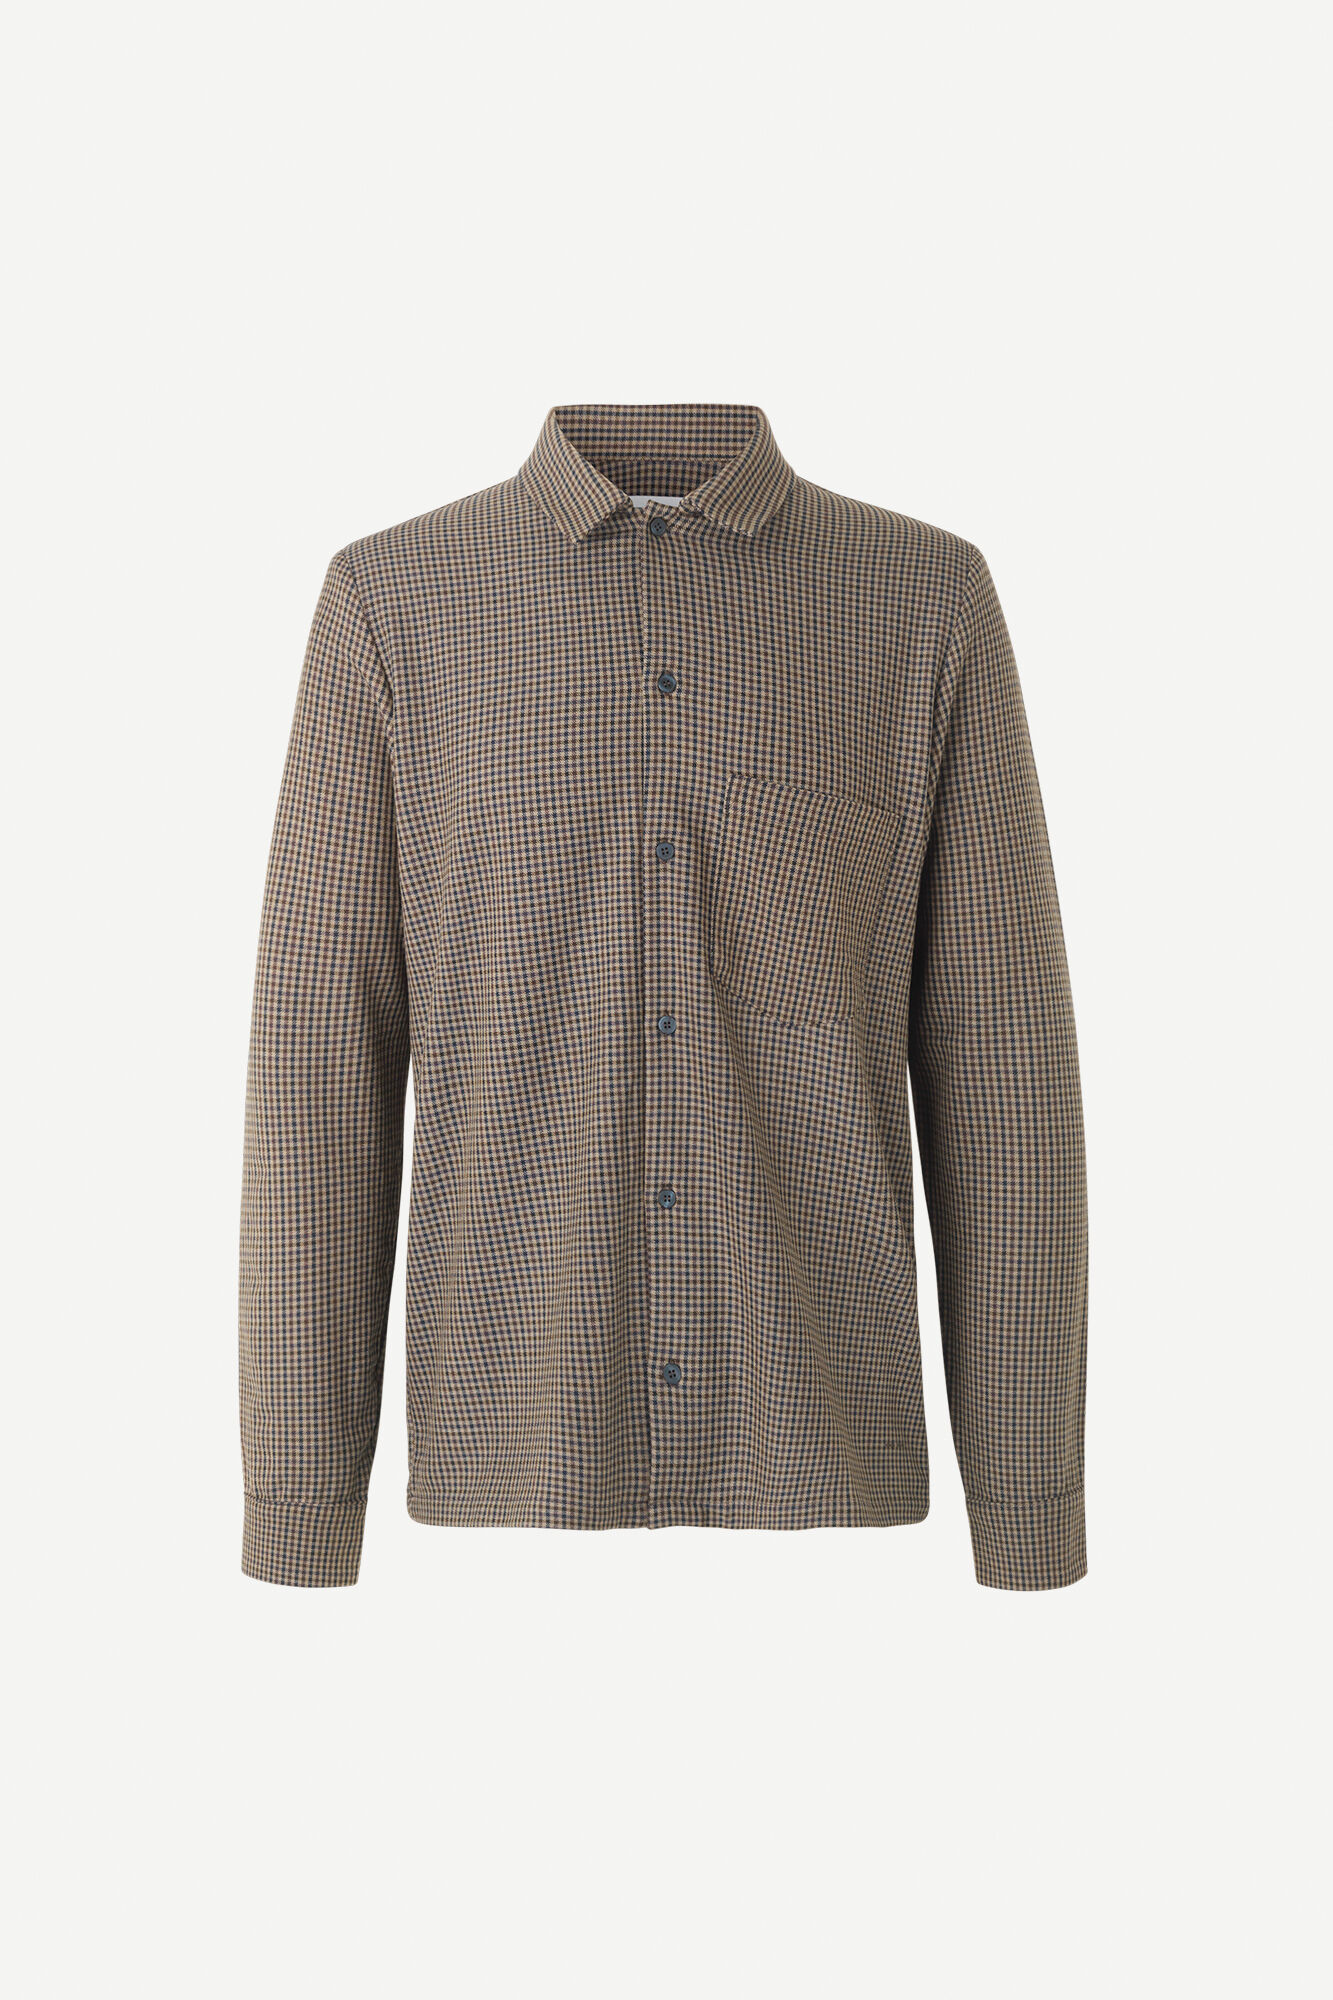 Taka JP shirt 12963